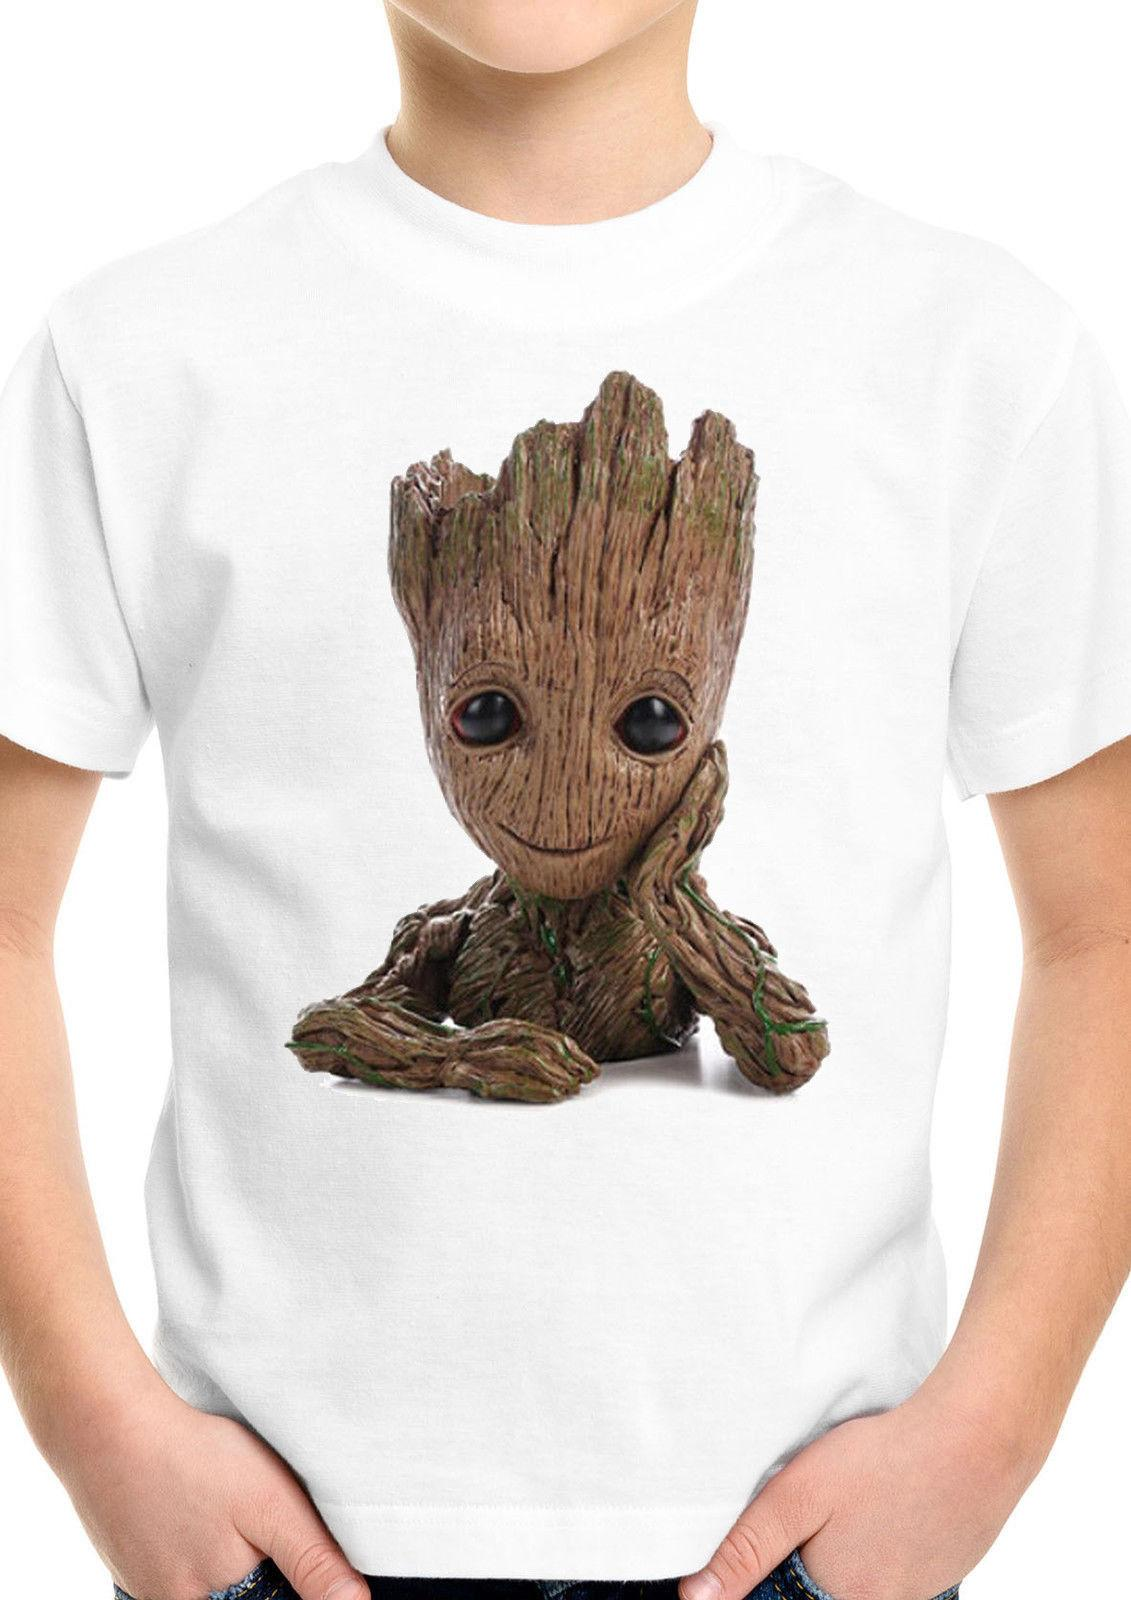 3bd7207aad7 Baby Groot Guardians Of The Galaxy Superhero Boy Girl Birthday Kids T shirt  893 Funny free shipping Unisex Casual